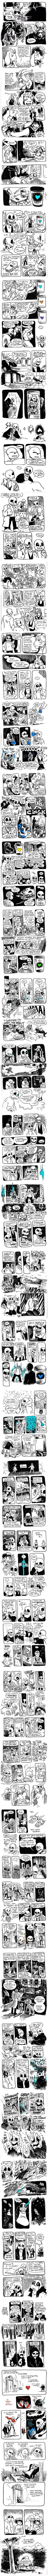 "Undertale - comic - ""Darker Yet Darker"" (full)"